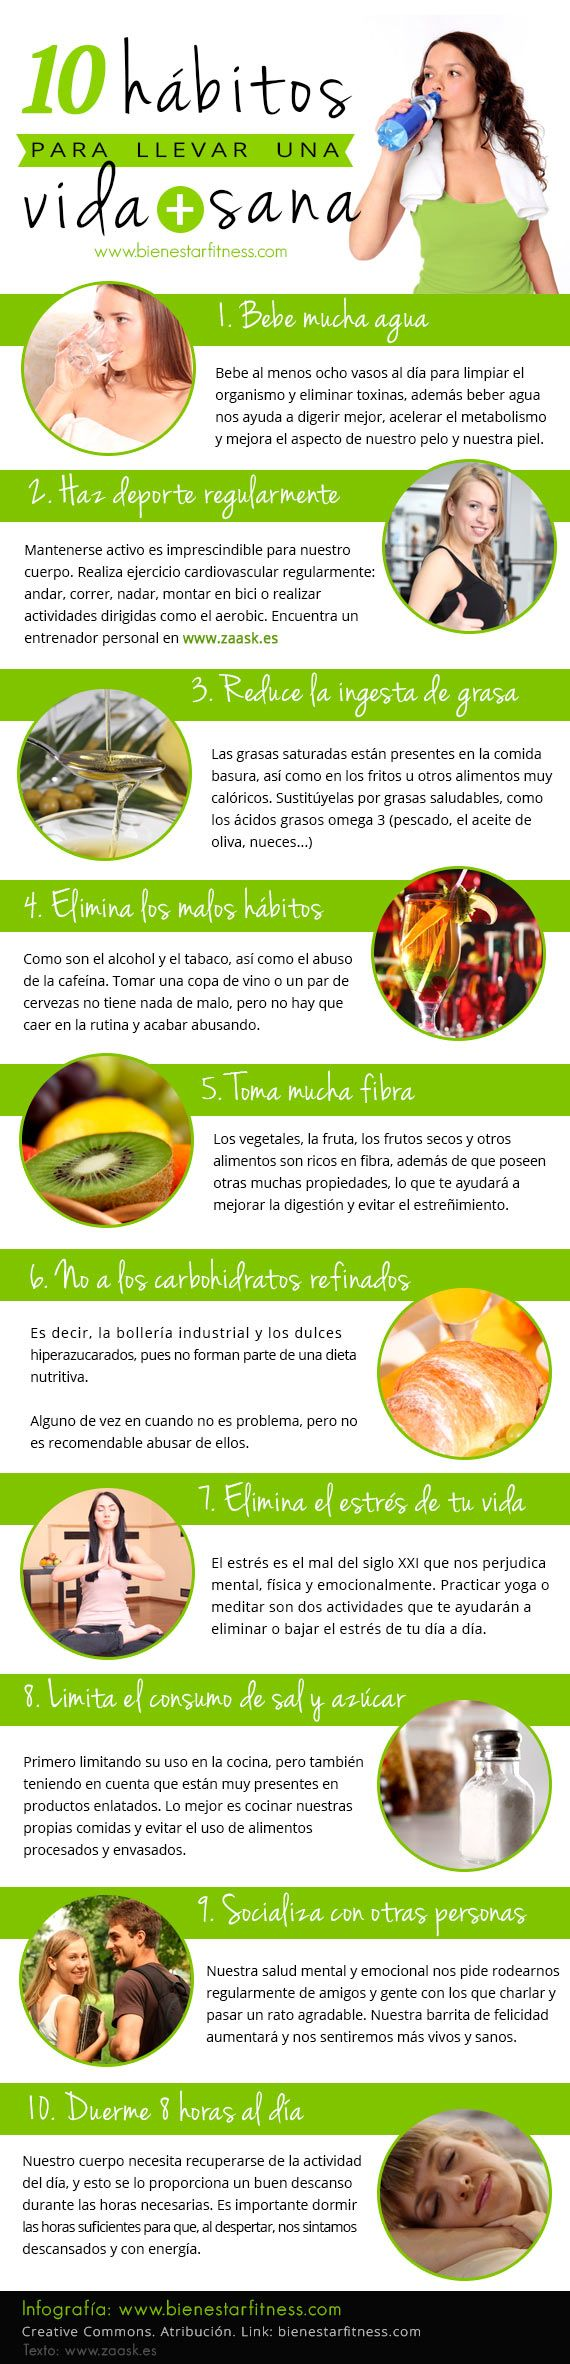 10 habitos para llevar una vida más sana infografia  #infografía #salud #vidasana #infographics  www.bienestarfitness.com Blog de Fitness en español